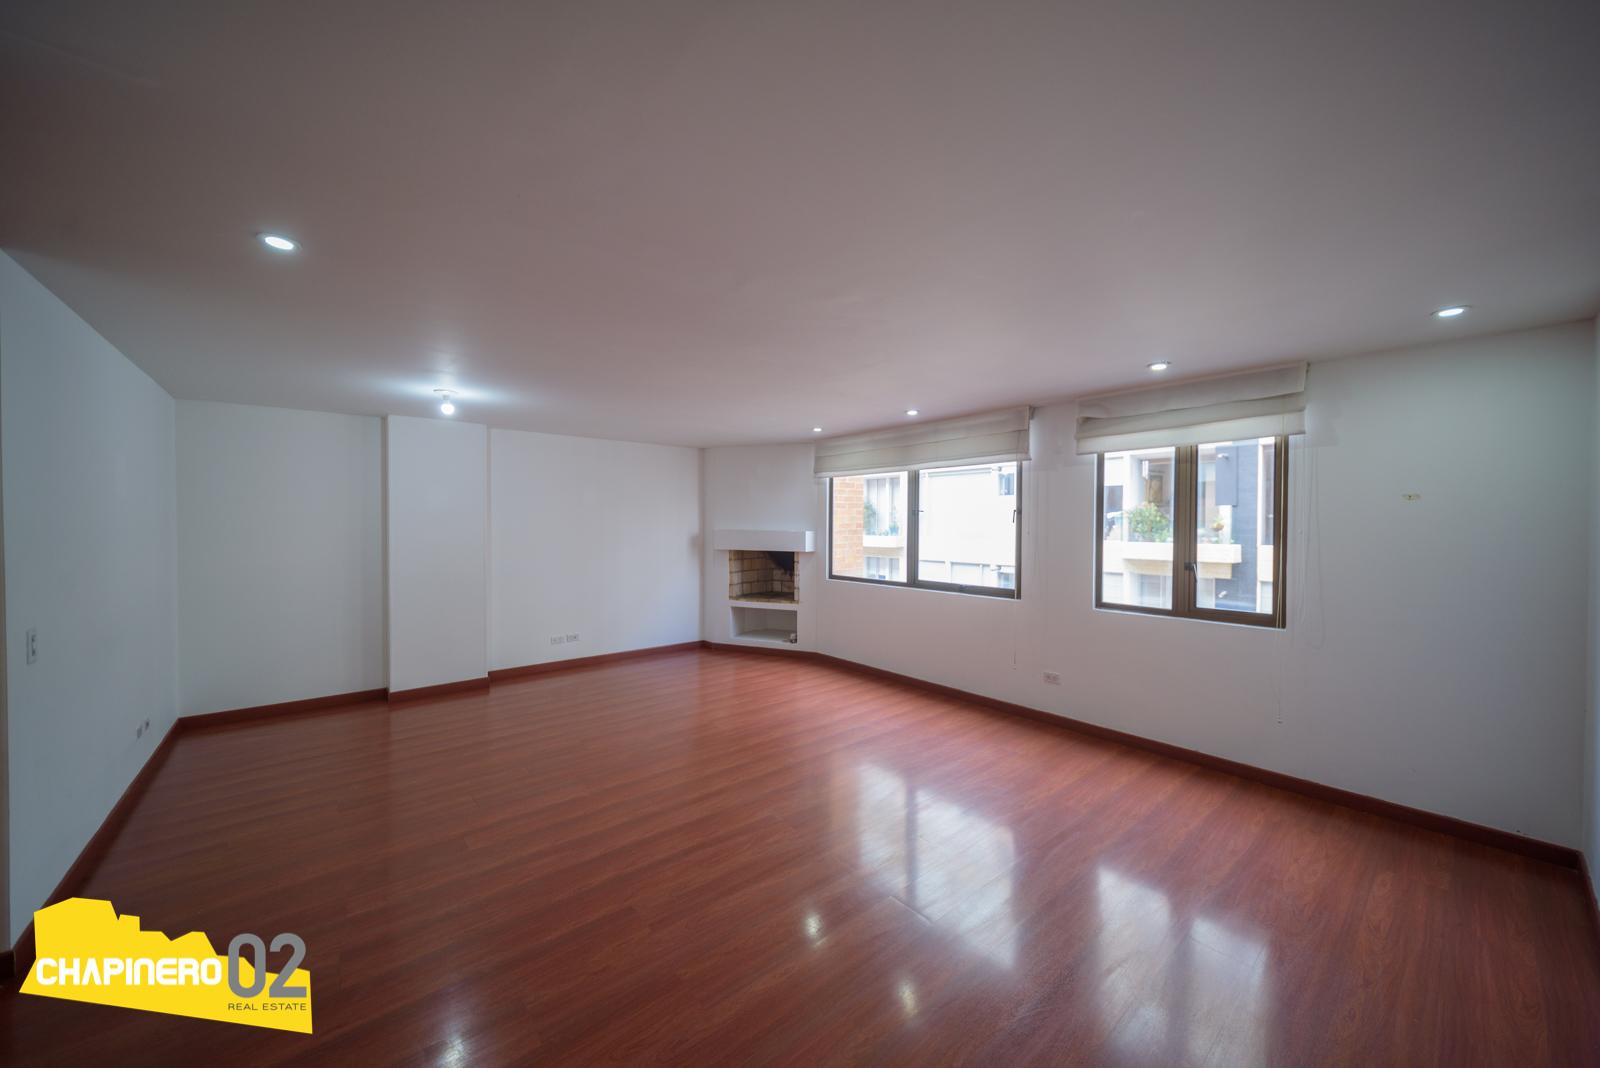 Apto Venta :: 82 m² :: Virrey :: $540M